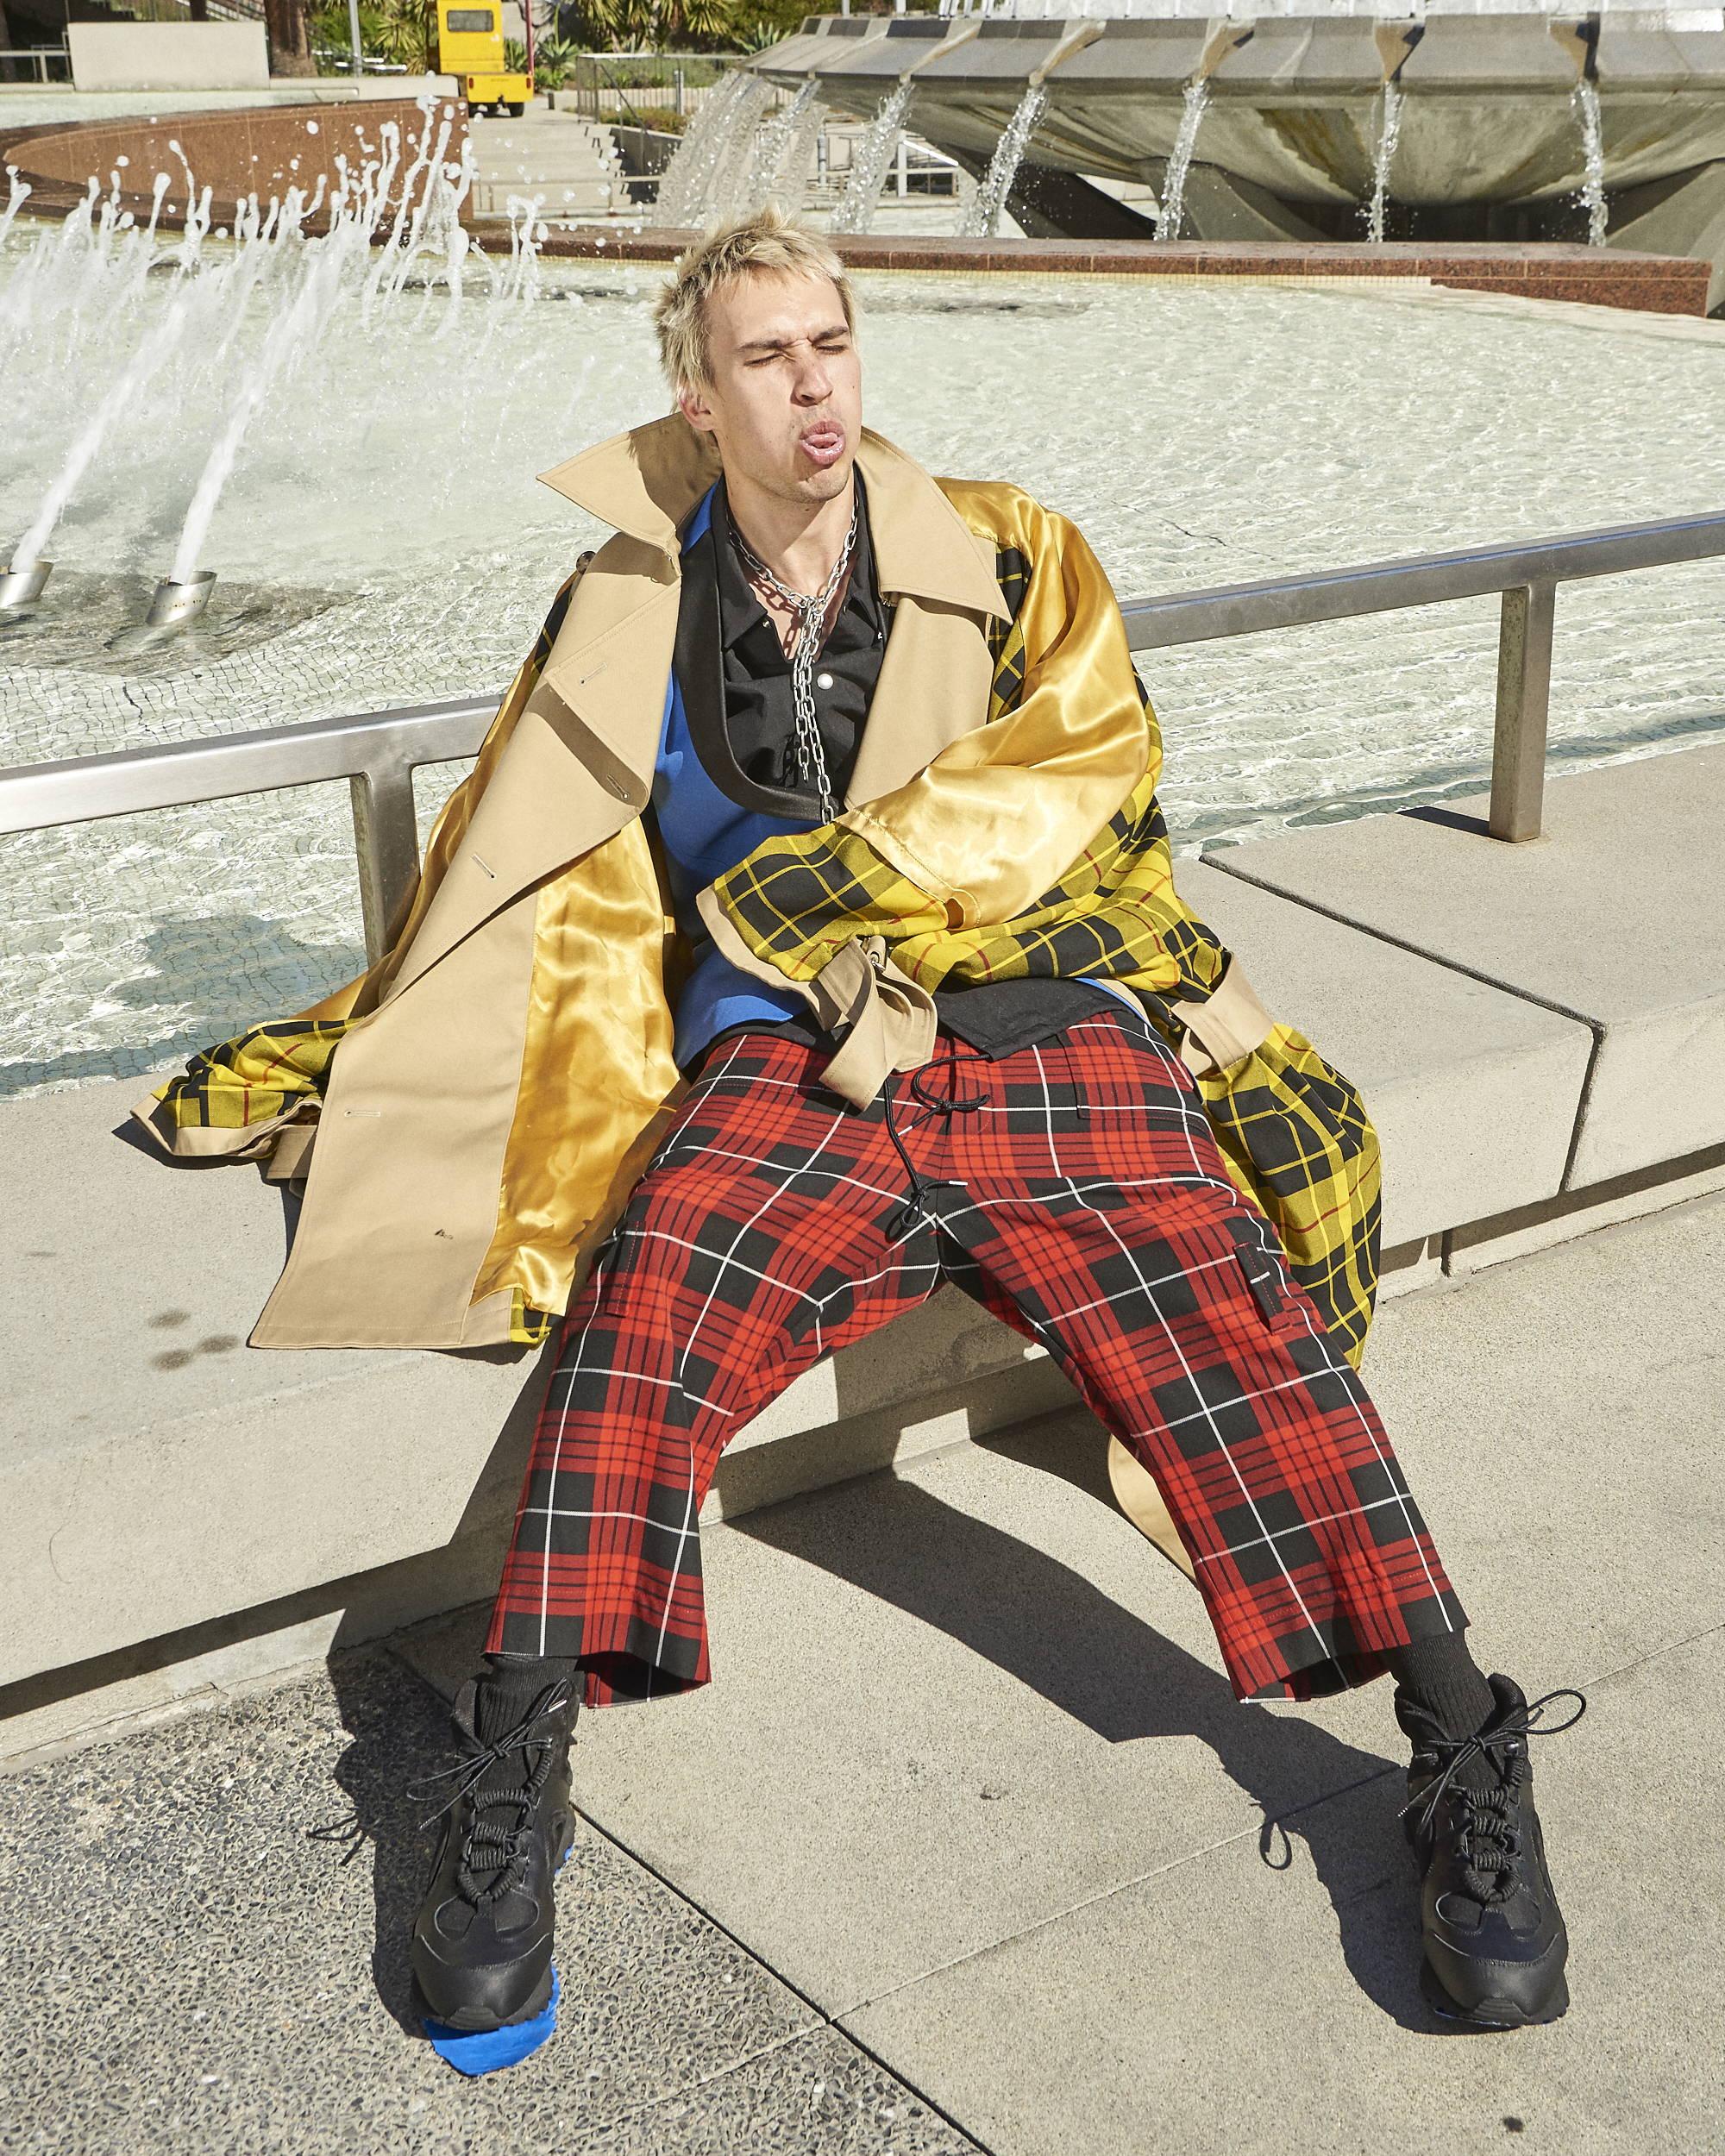 Kidill Punk Trench Coat F/W18 - Hlorenzo